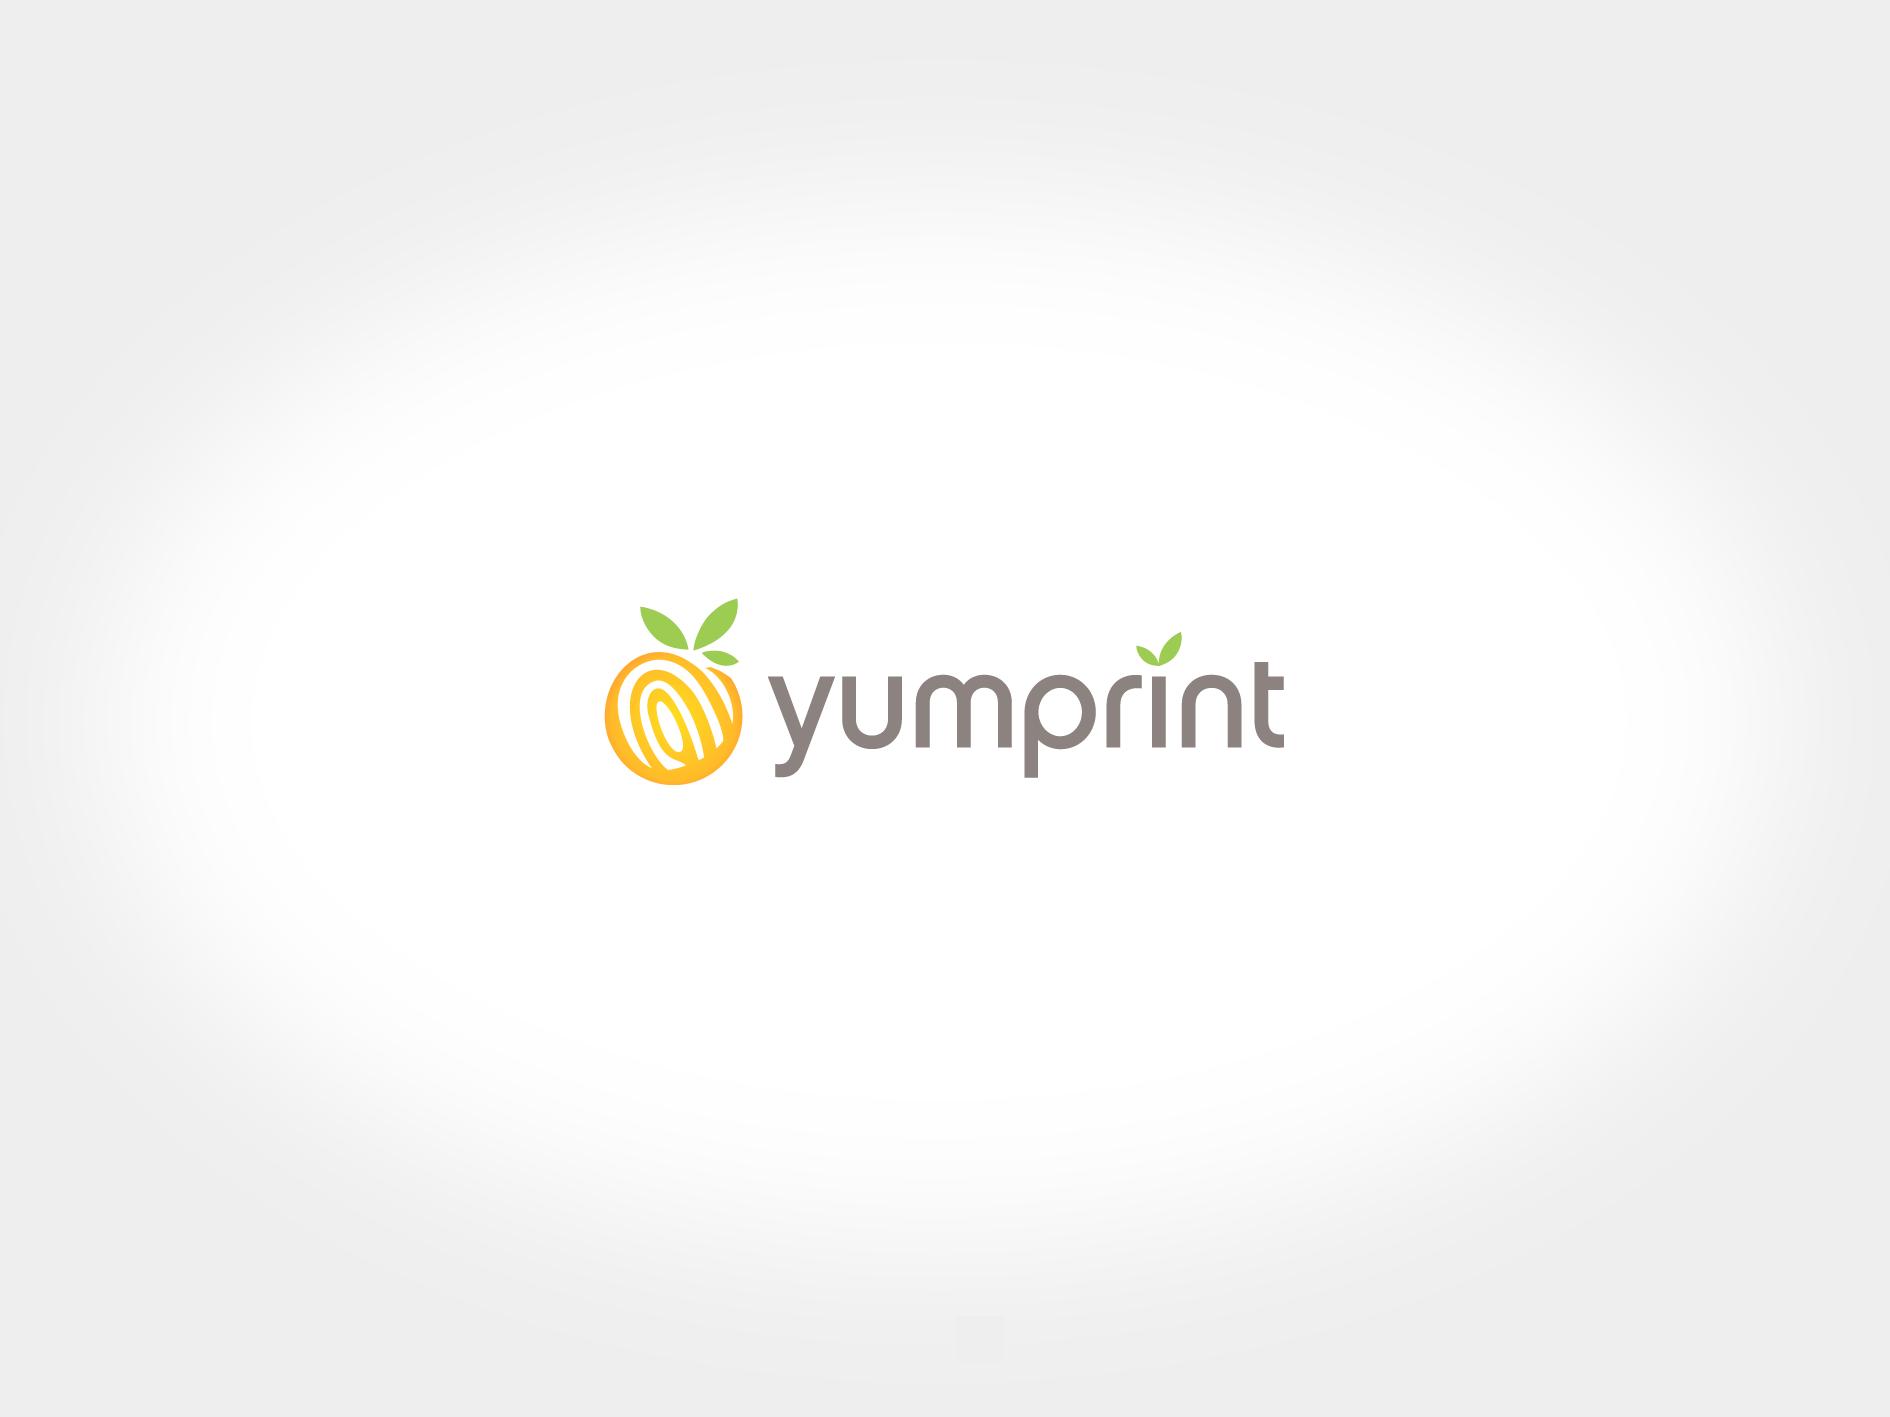 "yumprint ""your food thumbprint"" needs a new logo"